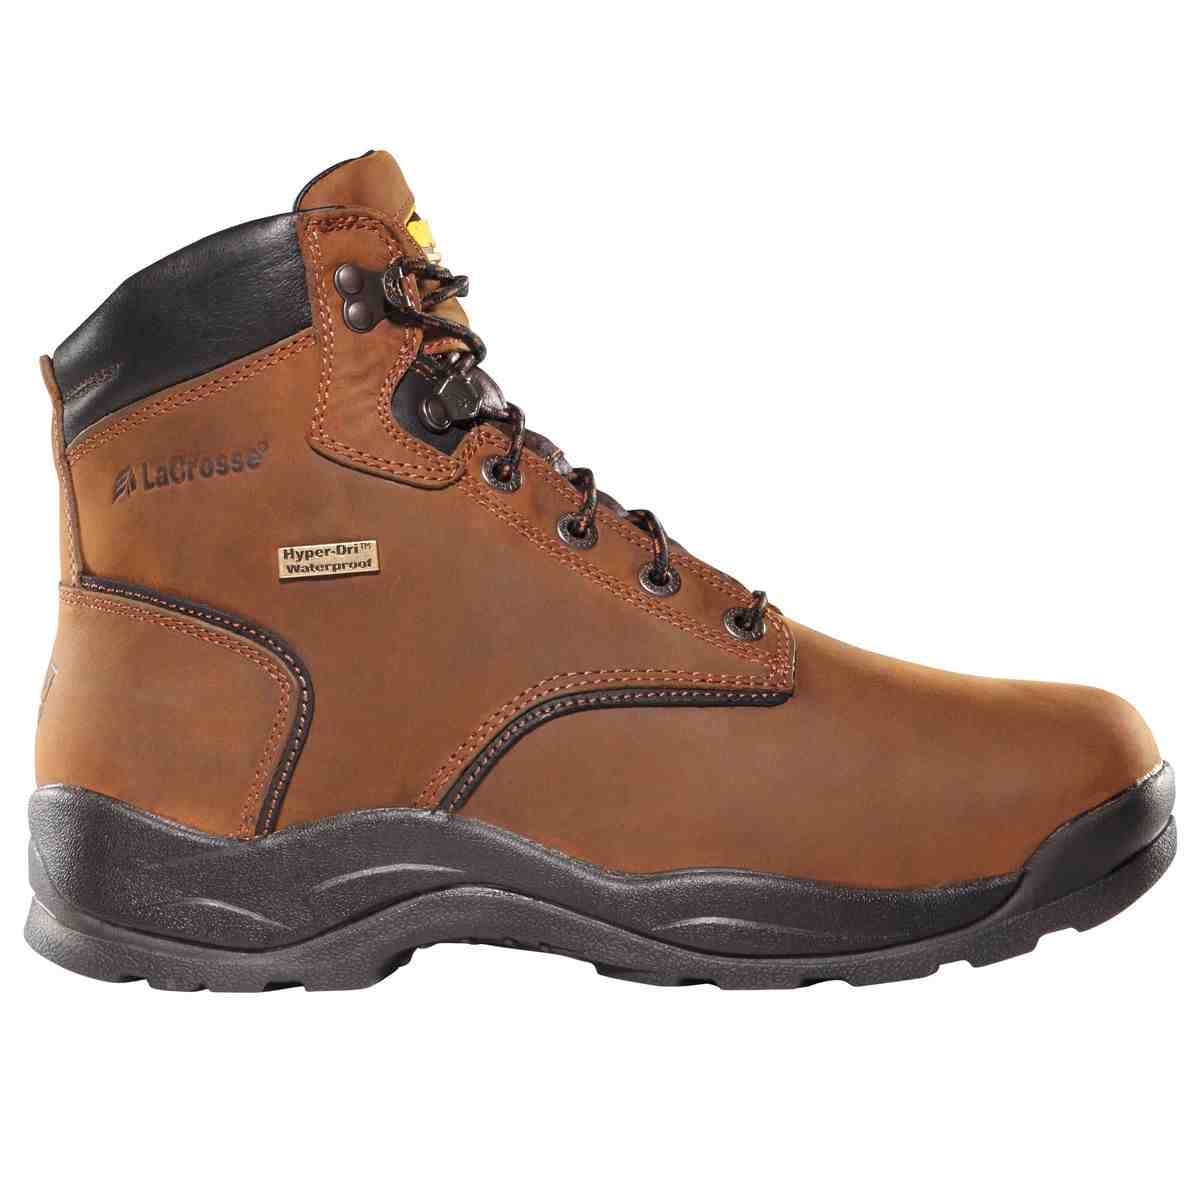 Lacrosse Buckmaster Boots Boots, Steel toe boots, Boots men